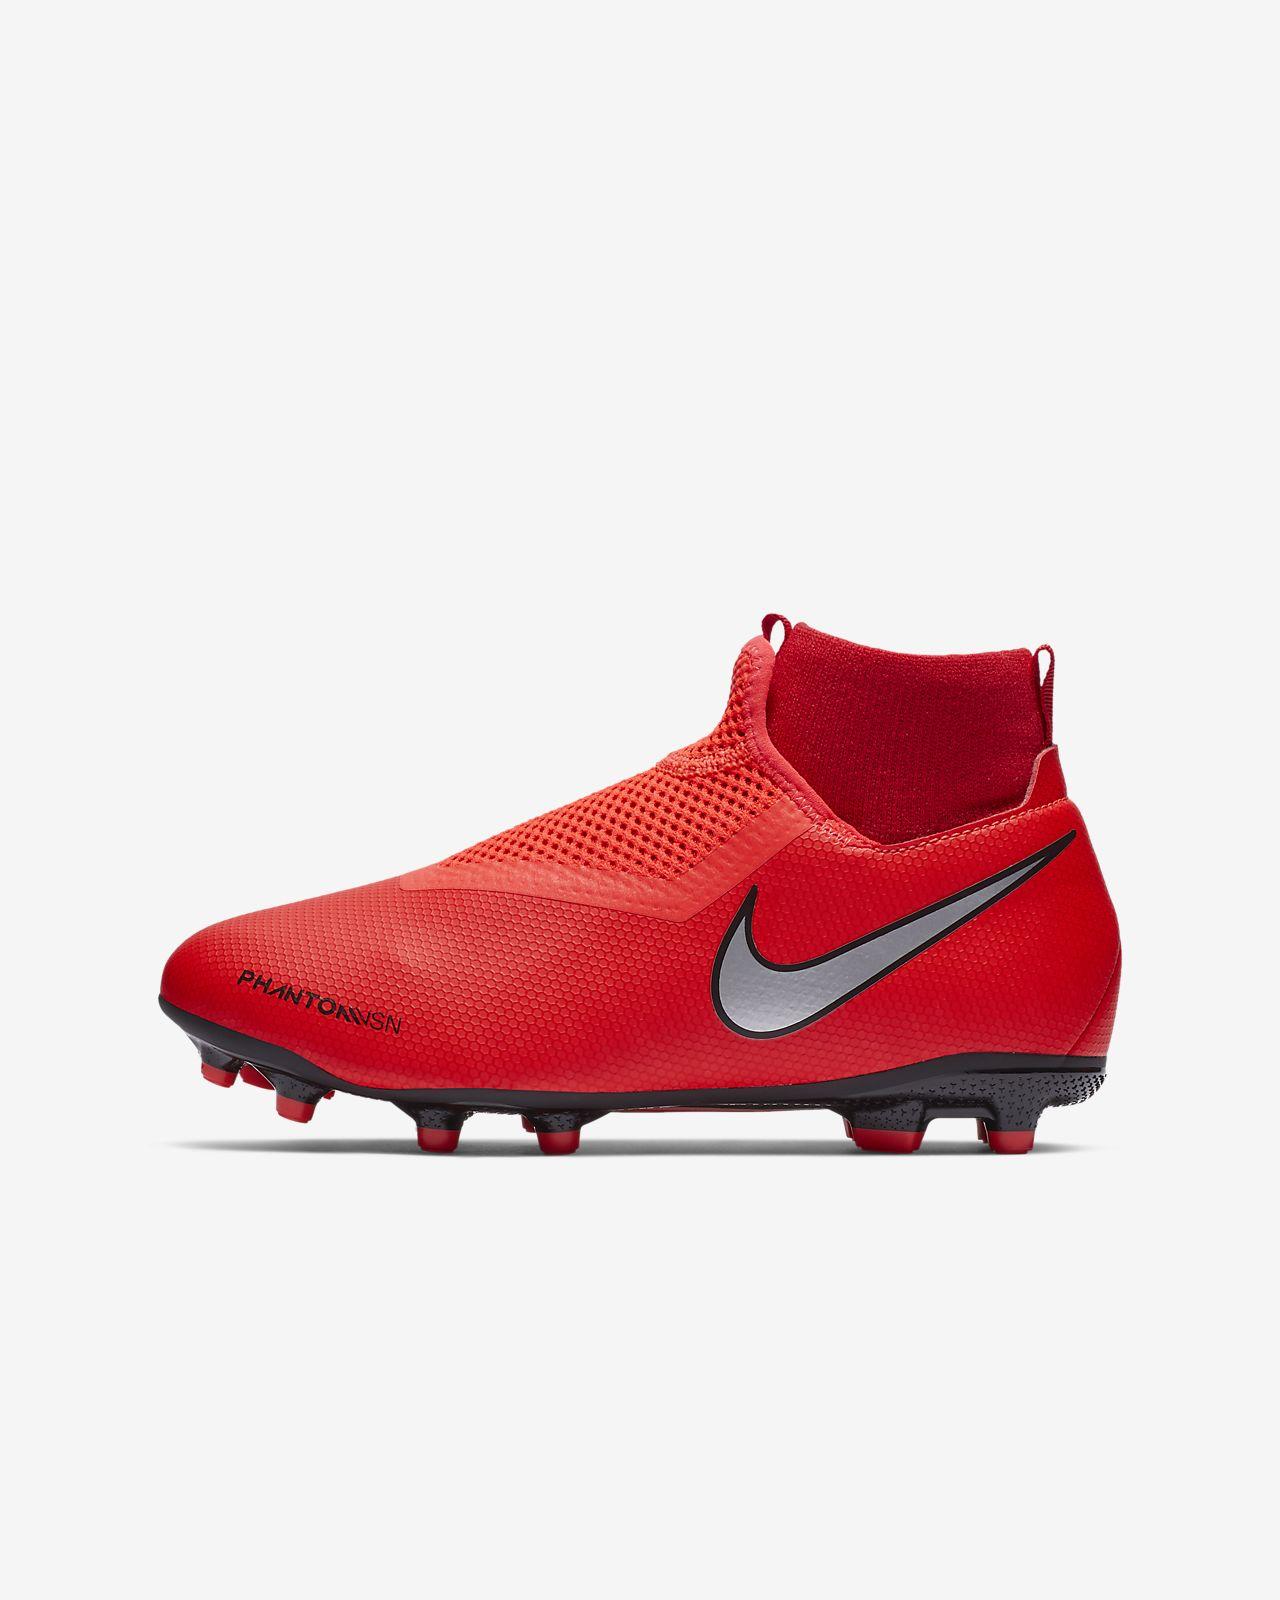 Nike Jr. PhantomVSN Academy Dynamic Fit Game Over MG Botas de fútbol para múltiples superficies - Niño/a y niño/a pequeño/a